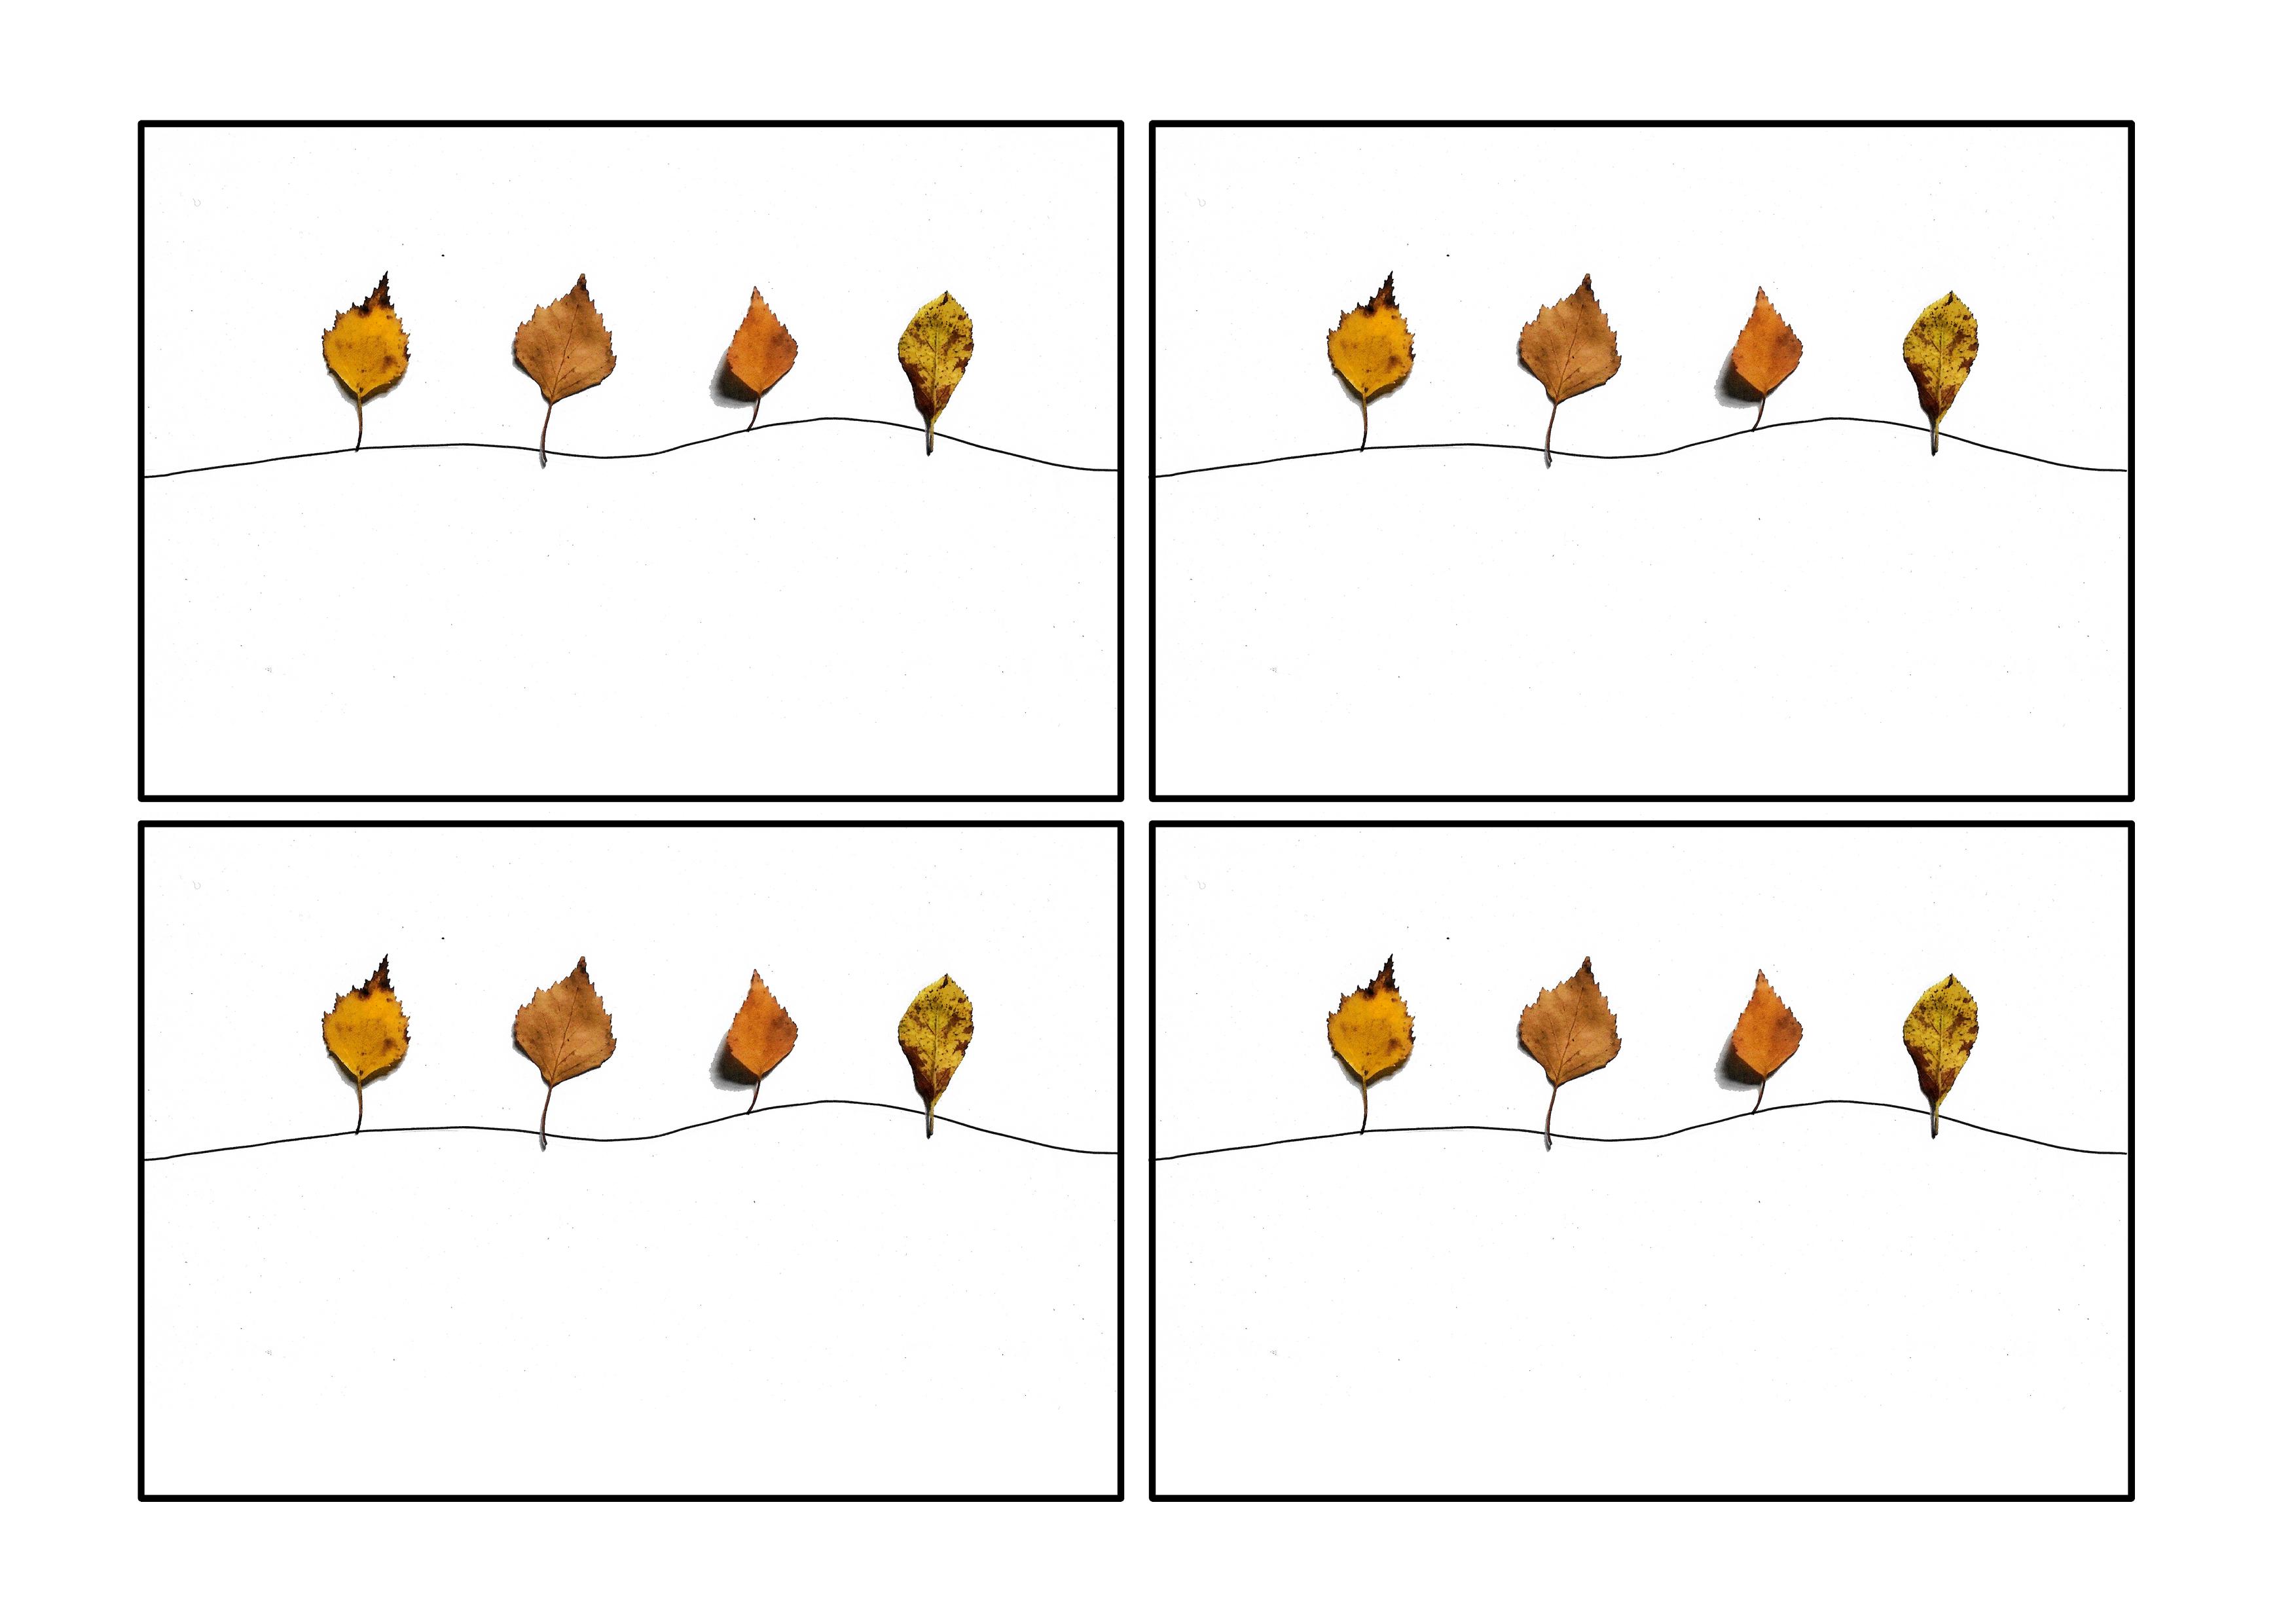 comics-club-page-templates-1-2x3-grid.jpg